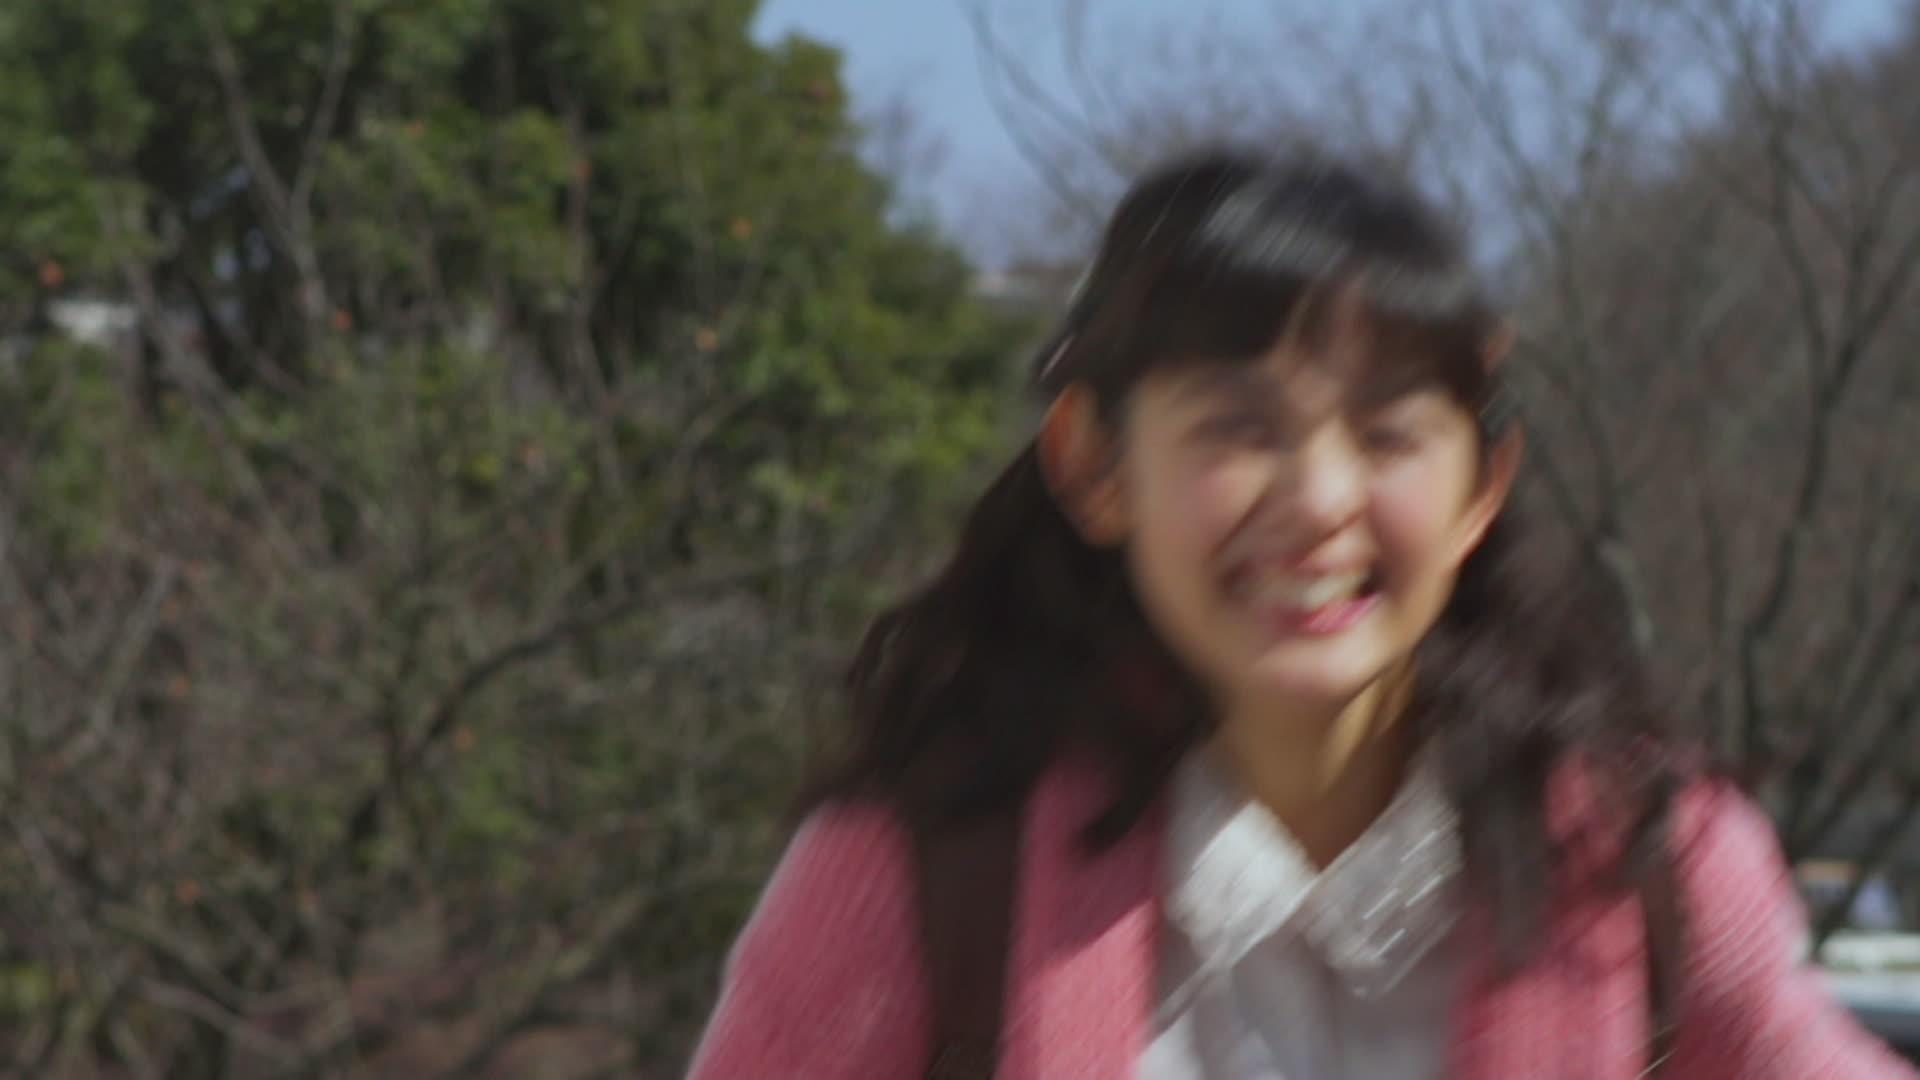 ITKS2_yokoku_shiro.mov111: Mischievous Kiss 2: Love in TOKYO